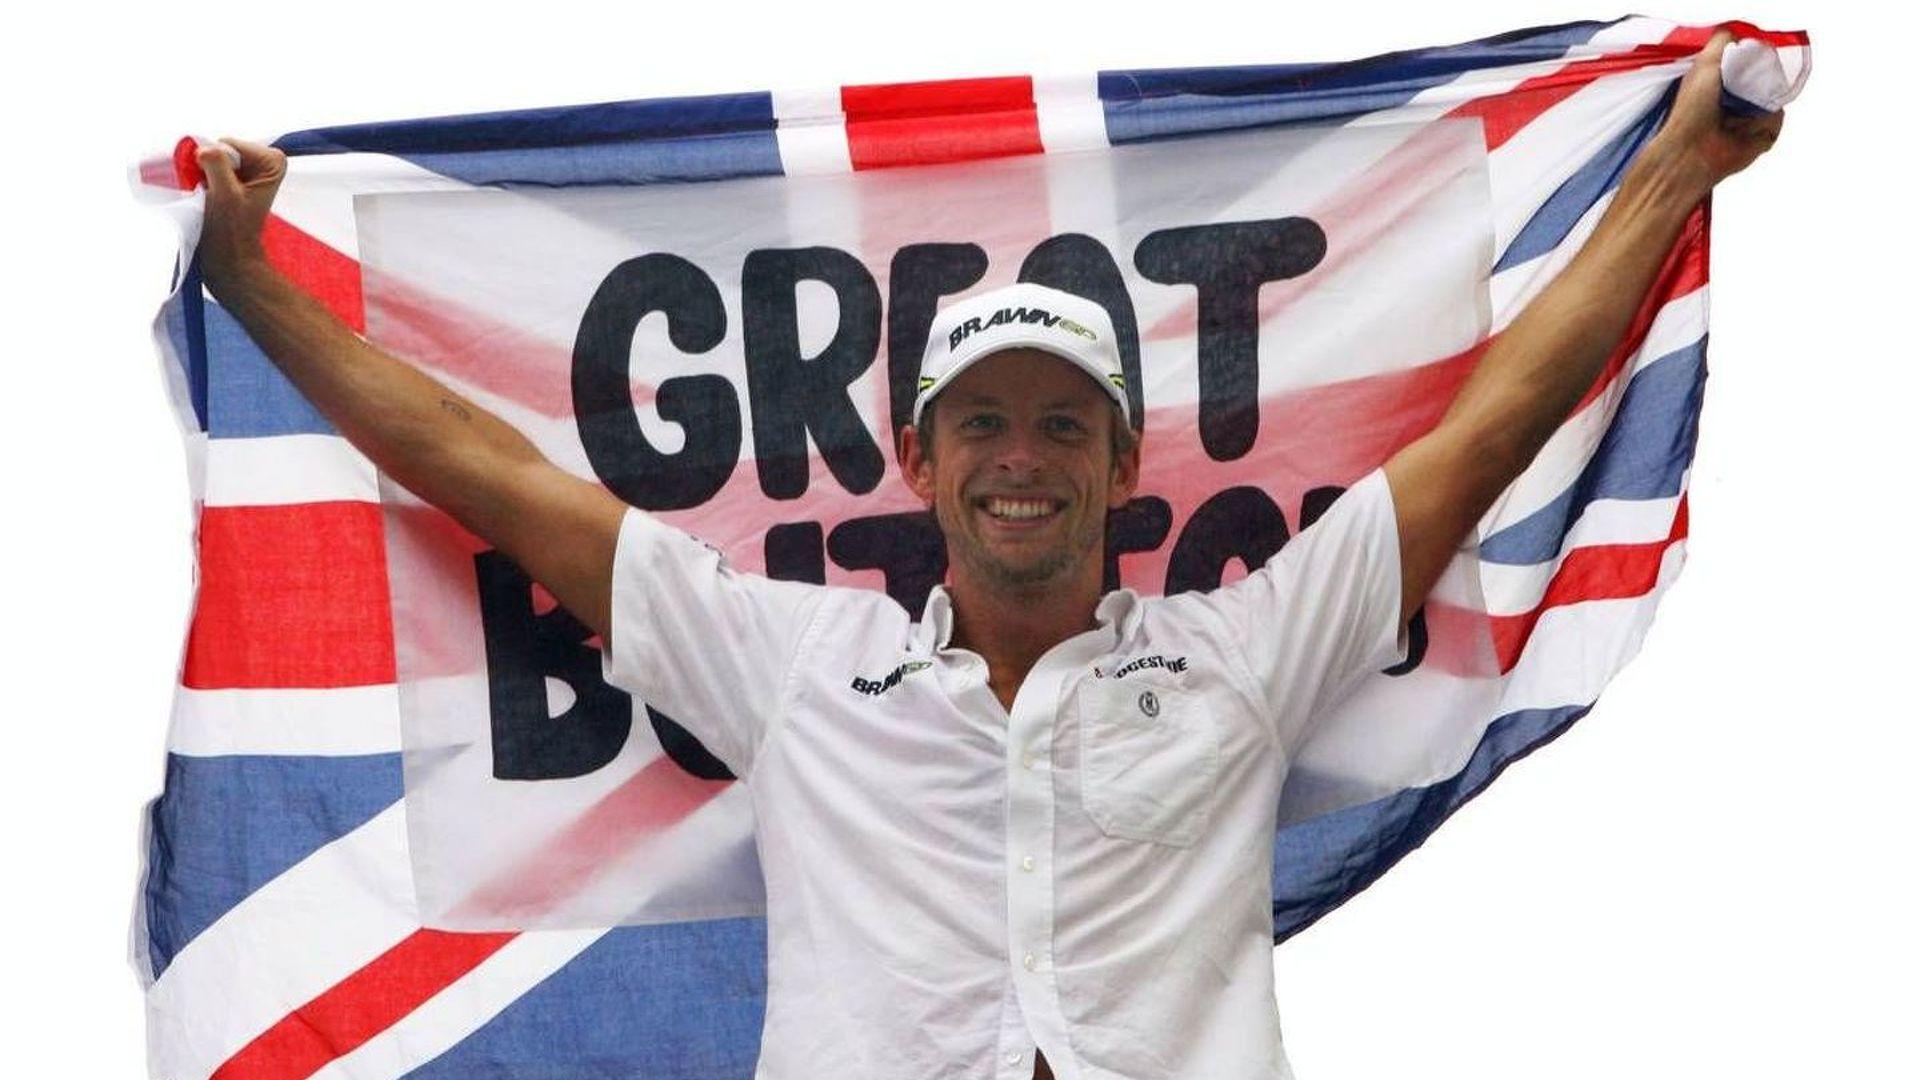 Ecclestone slams Brawn amid Button dispute